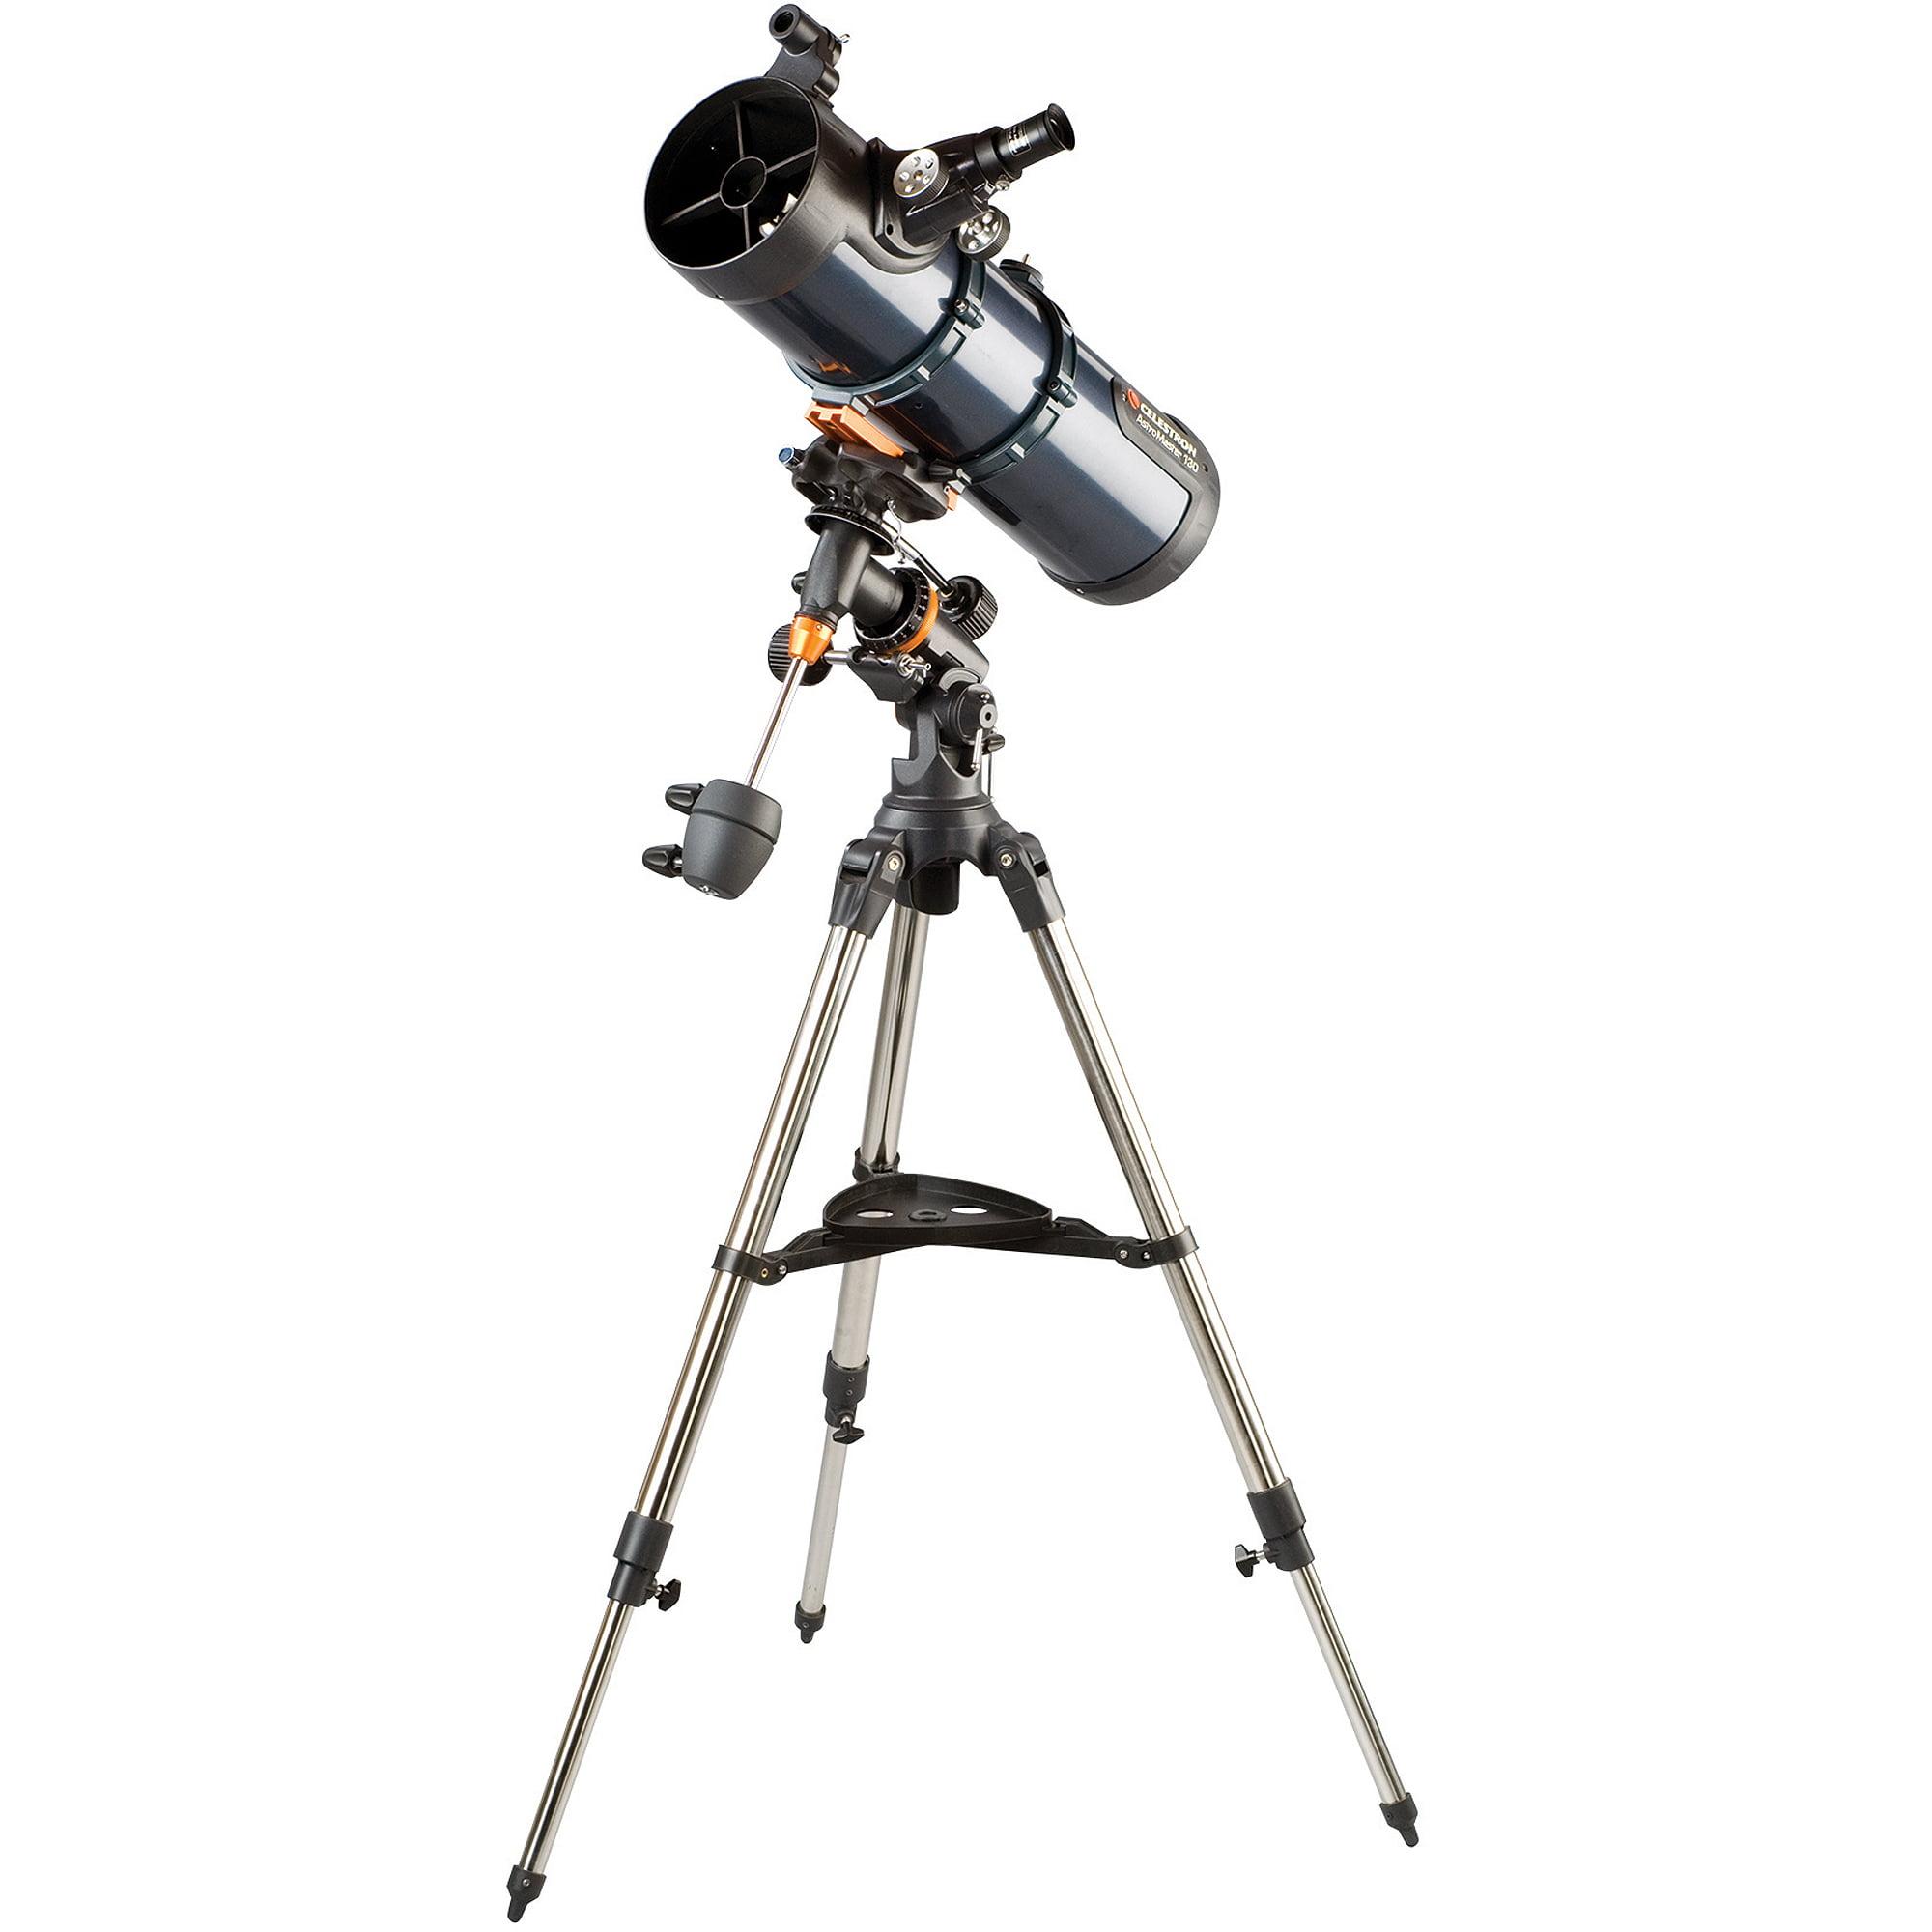 Celestron 31051 AstroMaster 130EQ-MD Telescope by Celestron